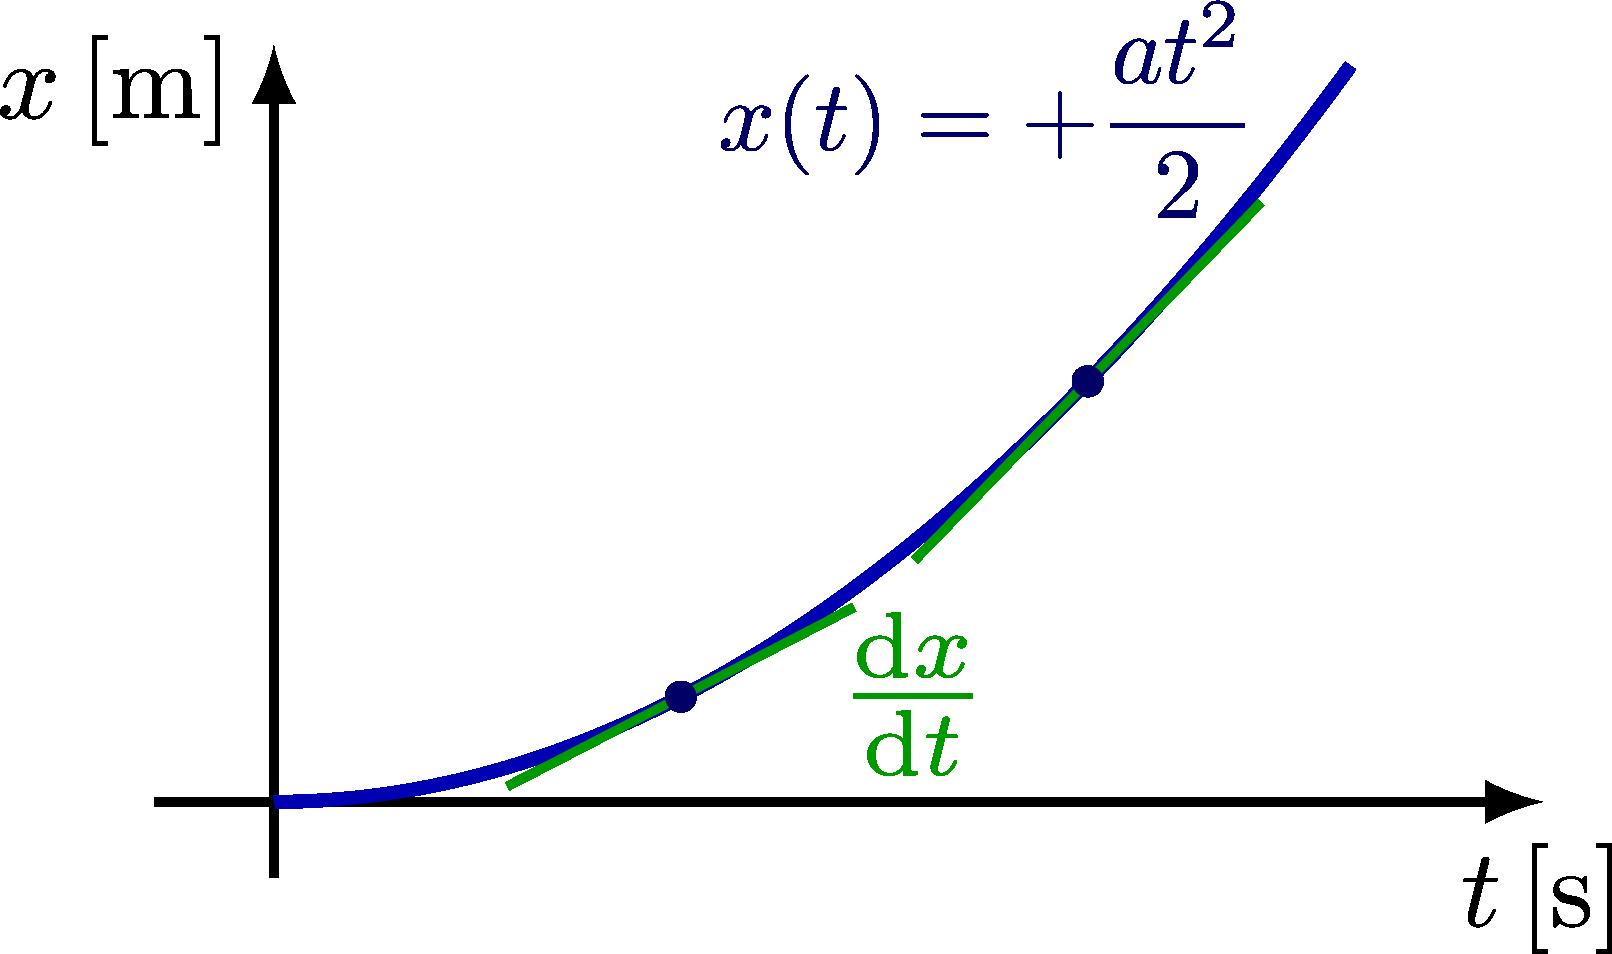 kinematics_curves-004.png